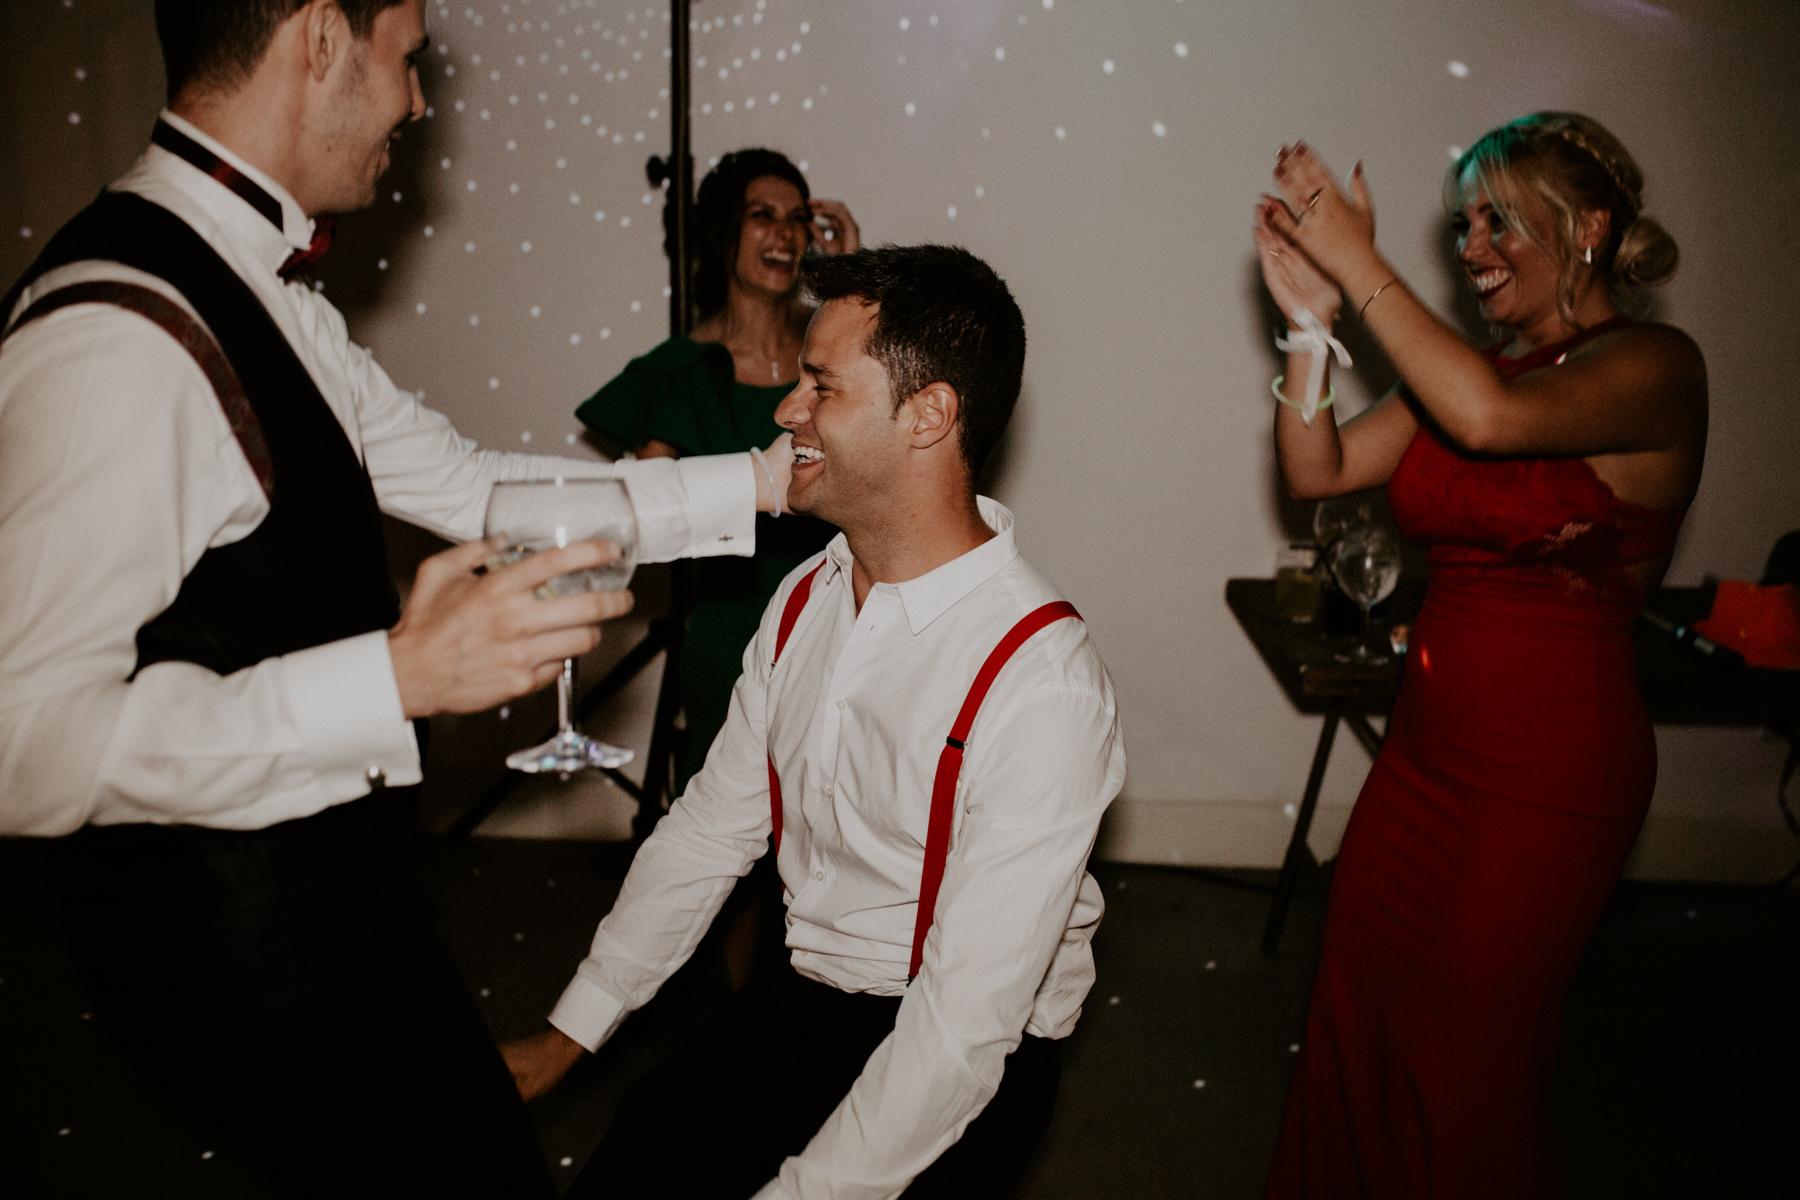 alt_thenortherngirlphotography_couples_weddingphotographer_photographer_wedding_boda_fotografodebodas_fotografobodasbarcelona_bodaindie_bodasconestilo_bodaensantperedeclara_jennifermiguel-1059.jpg